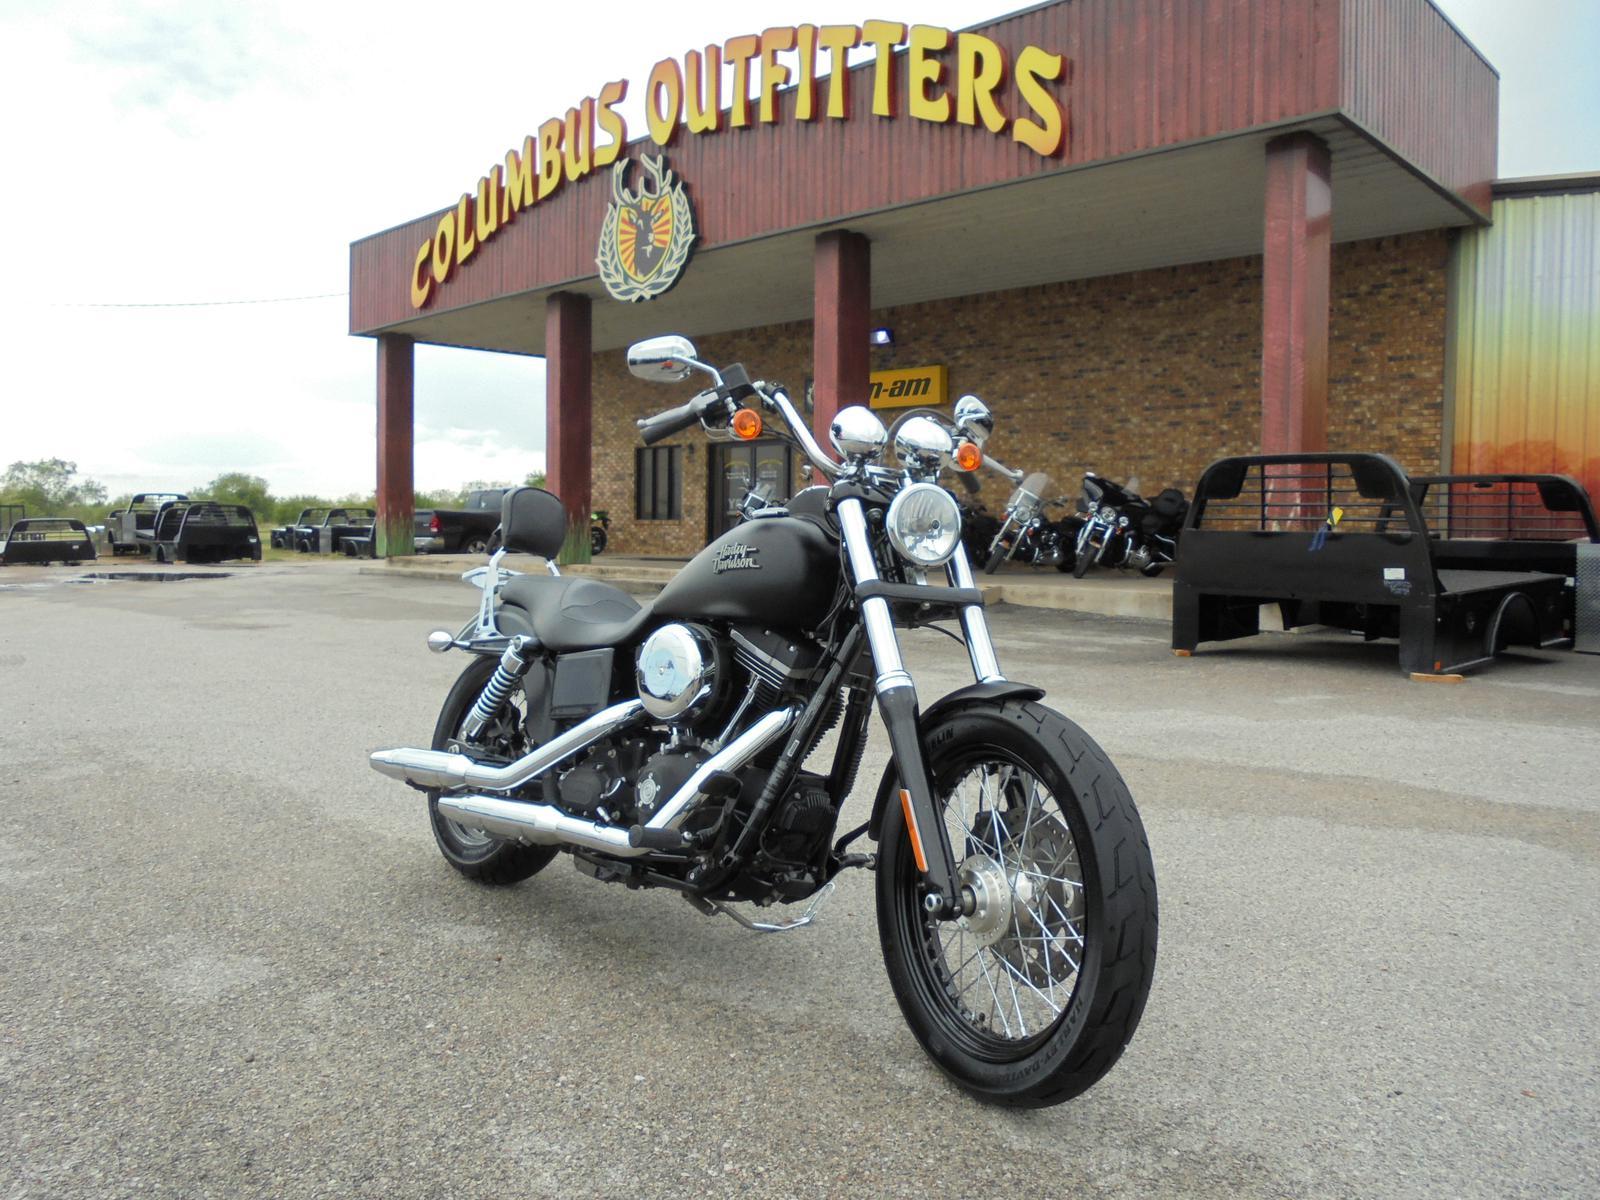 2013 Harley-Davidson® FXDBI - DYNA STREET BOB